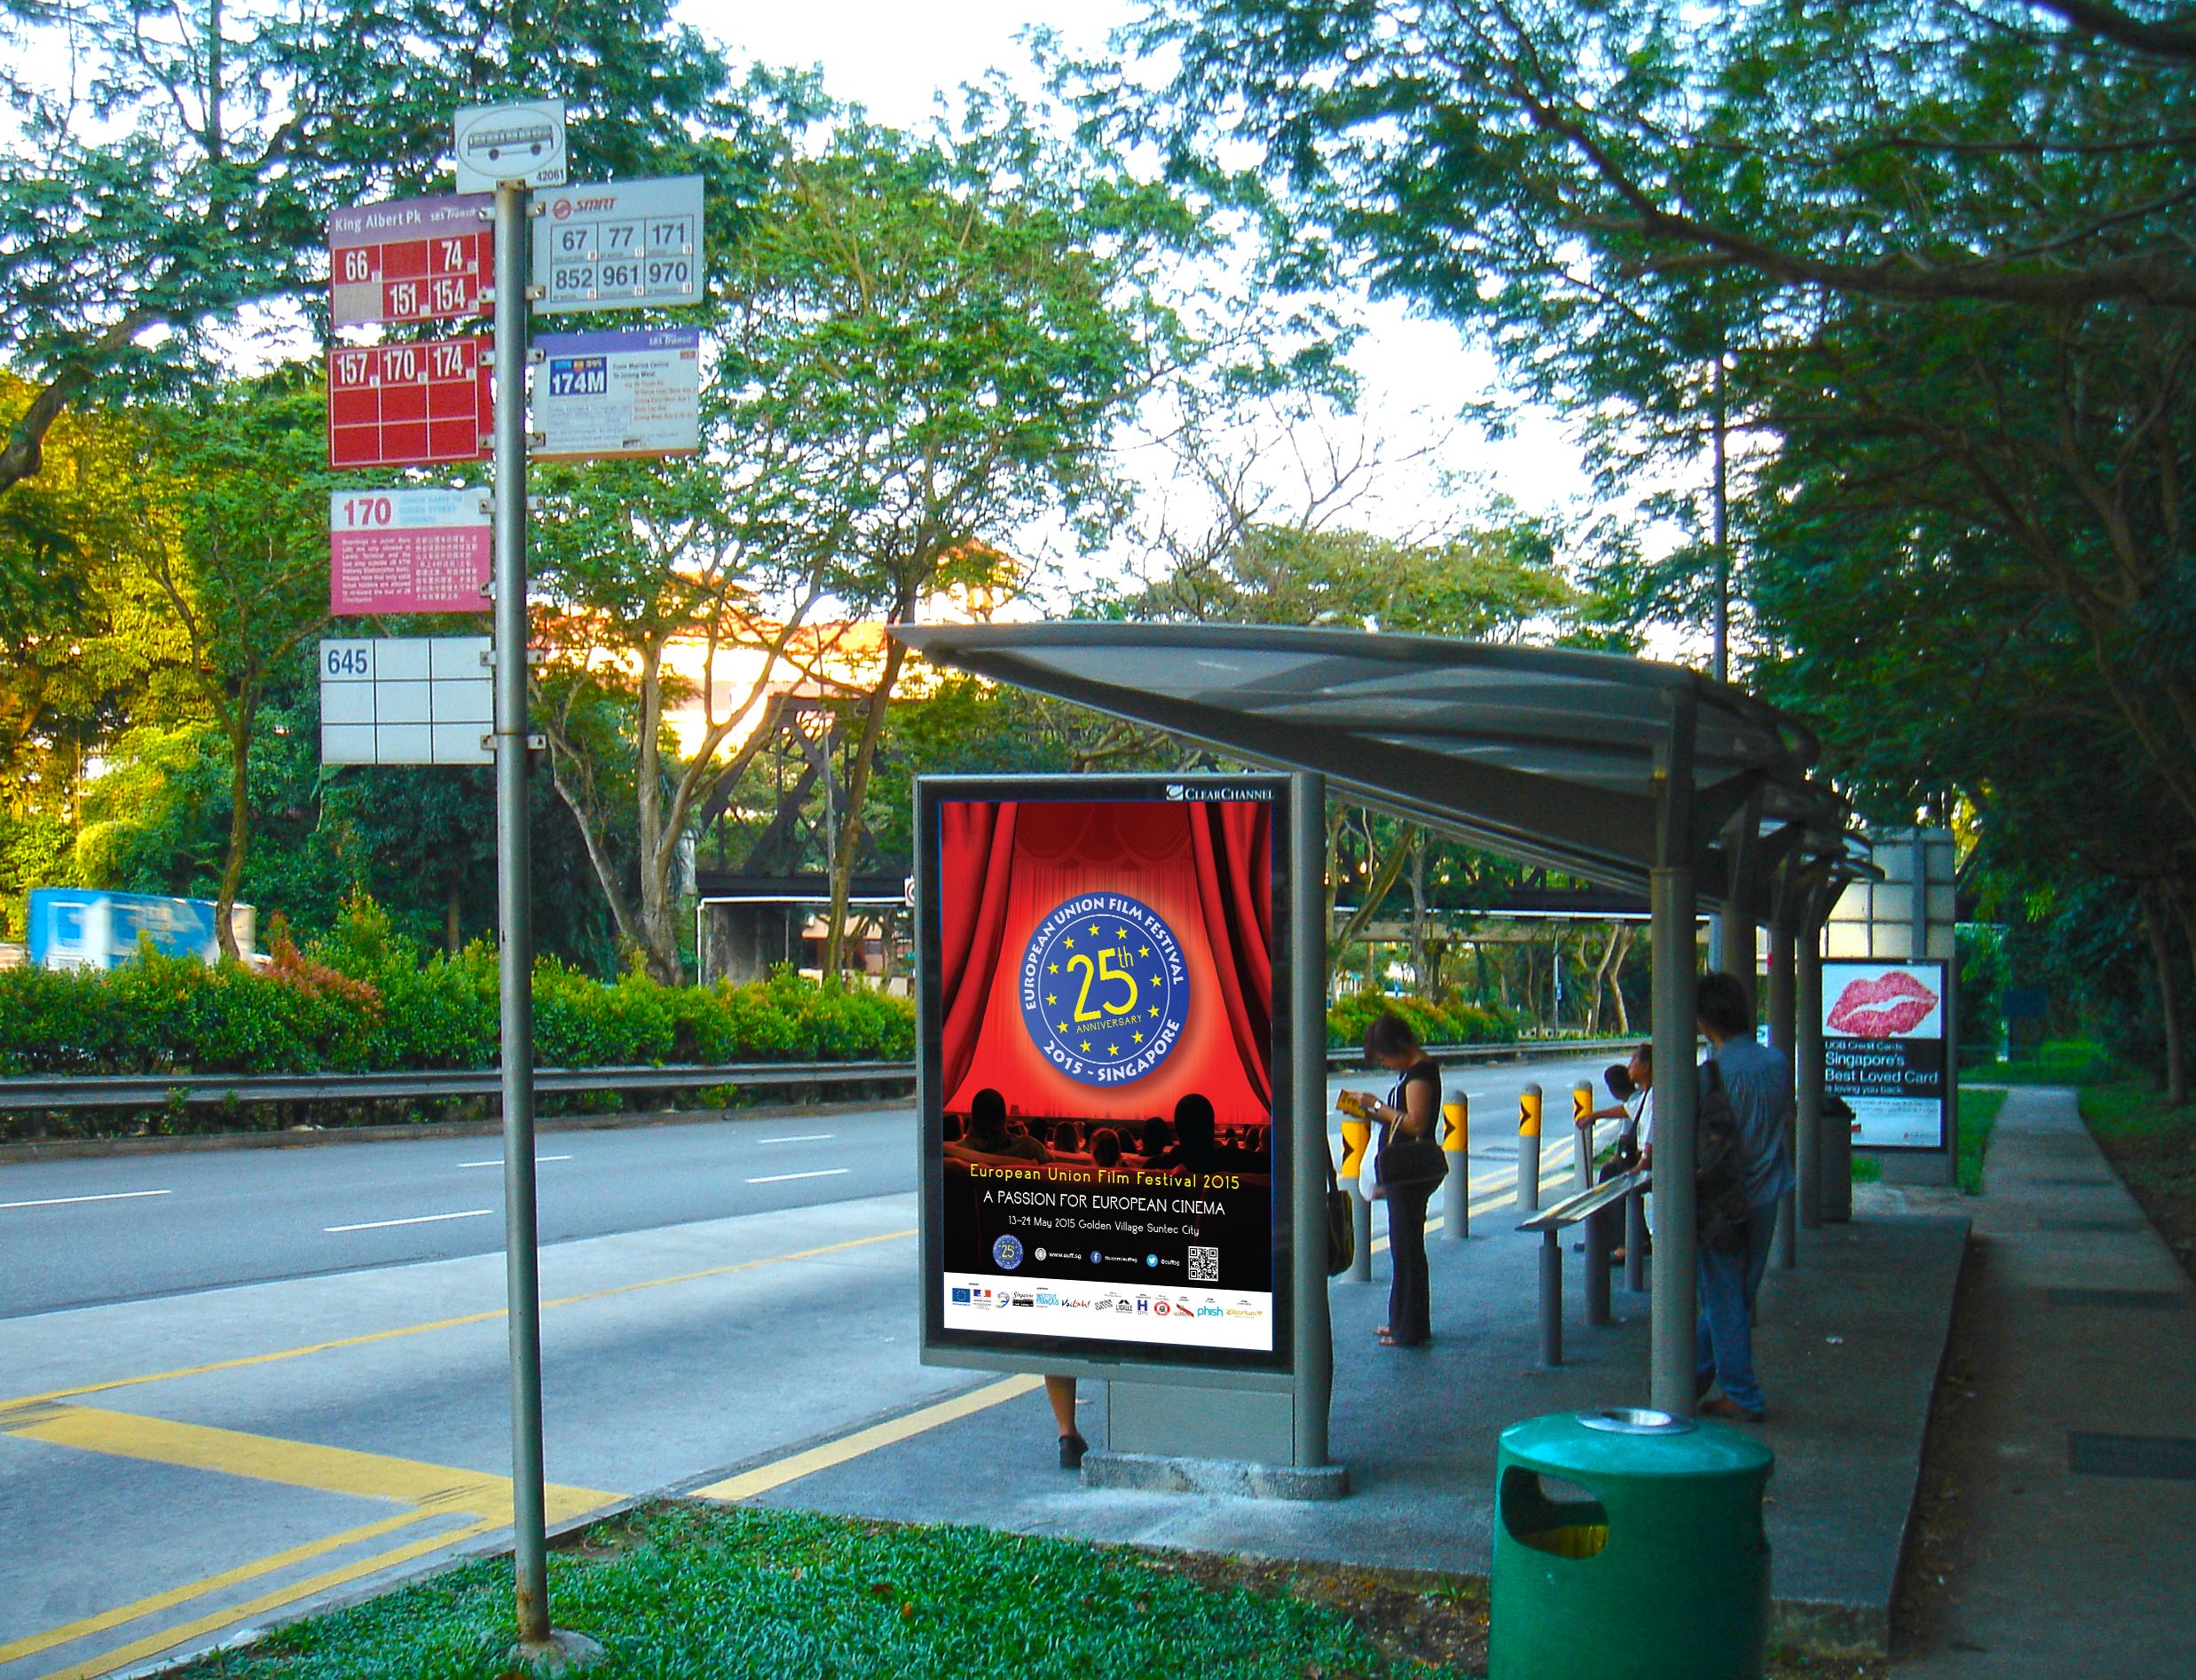 EUFF 25th Singapore